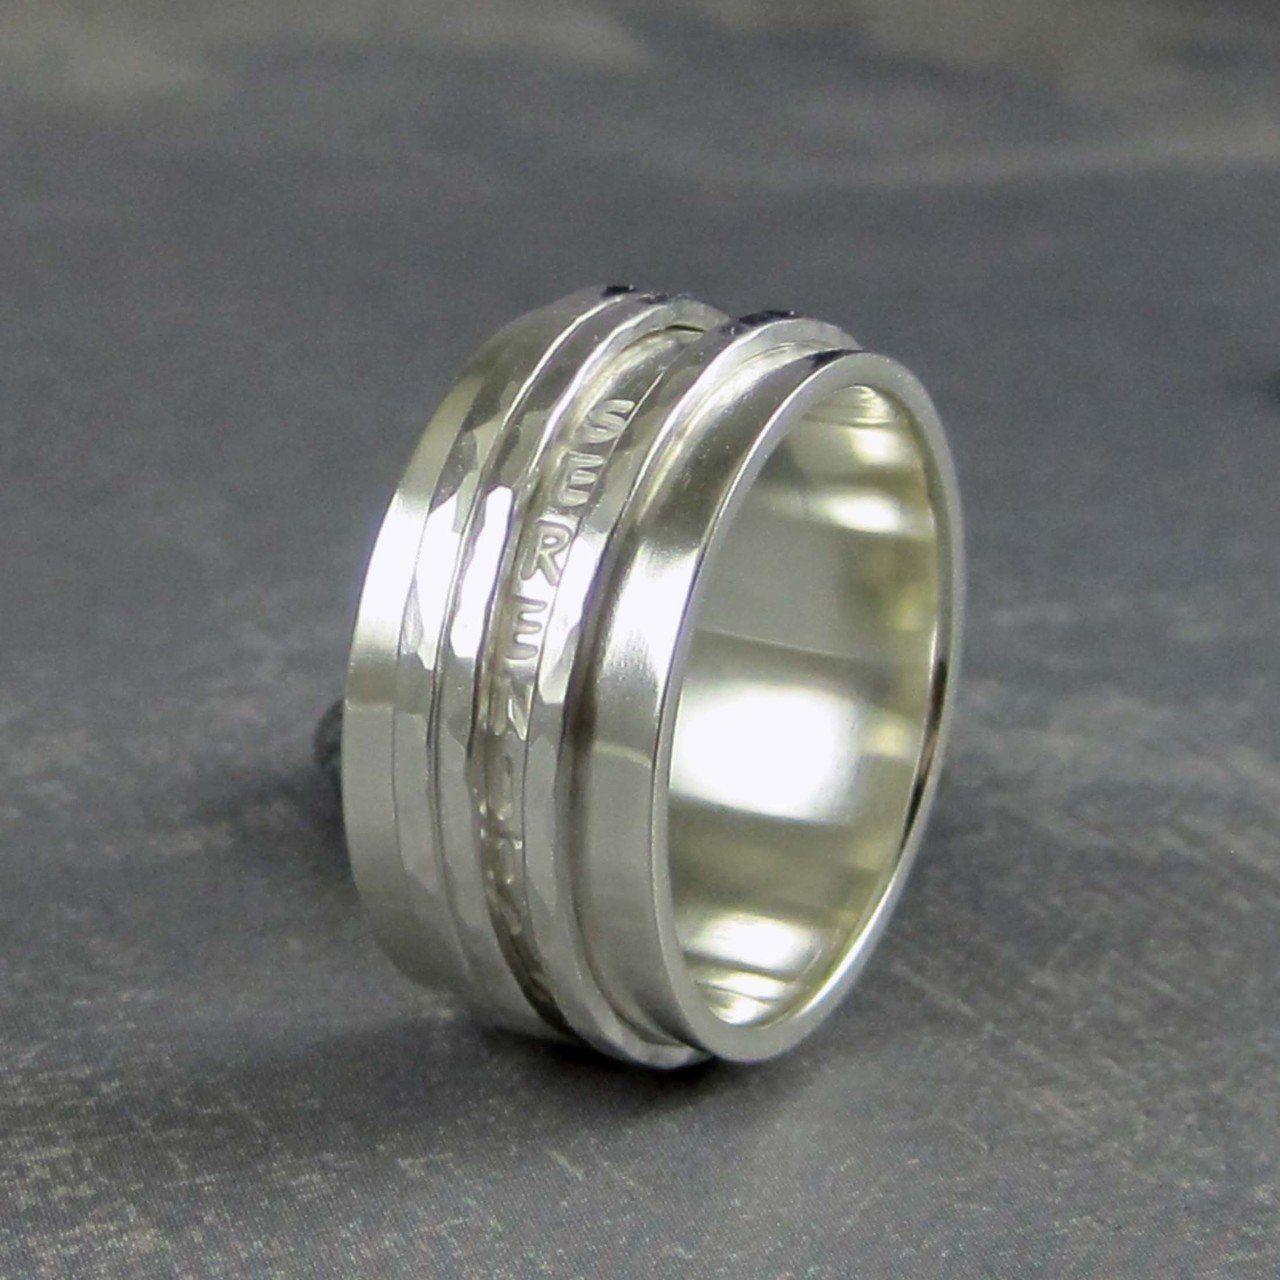 Serenity Prayer Ring In Sterling Silver Spinner Ring Serenity Prayer Ring Recovery Jewelry Rings For Men